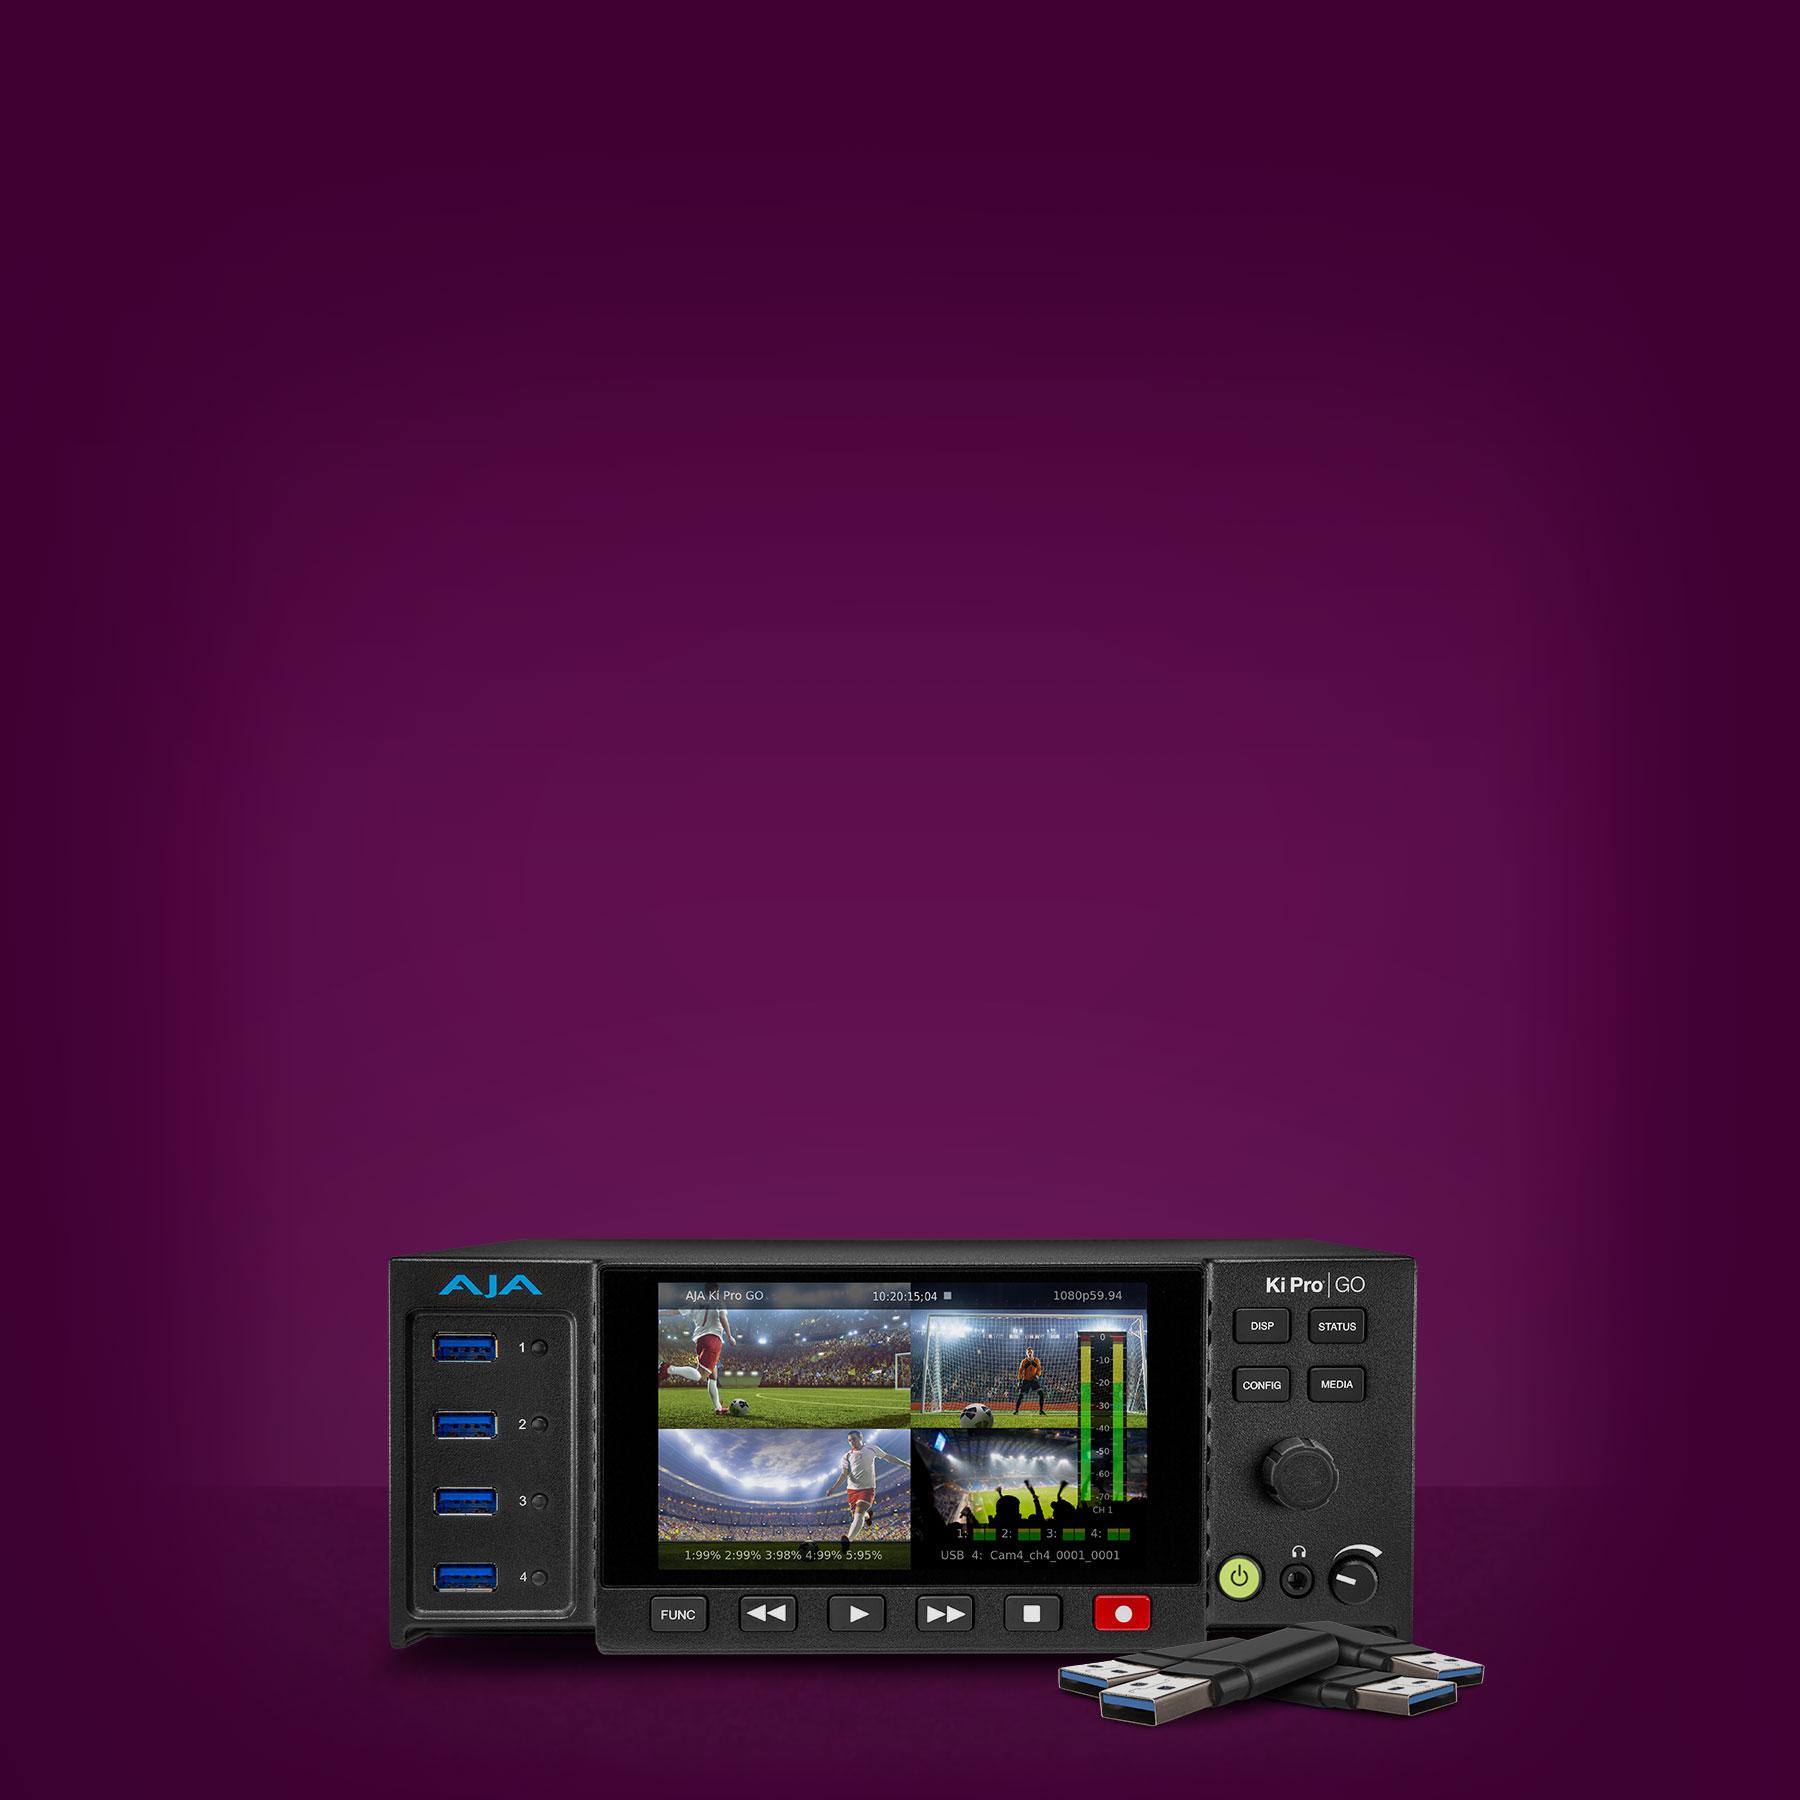 Ki Pro GO v2.0 Firmware